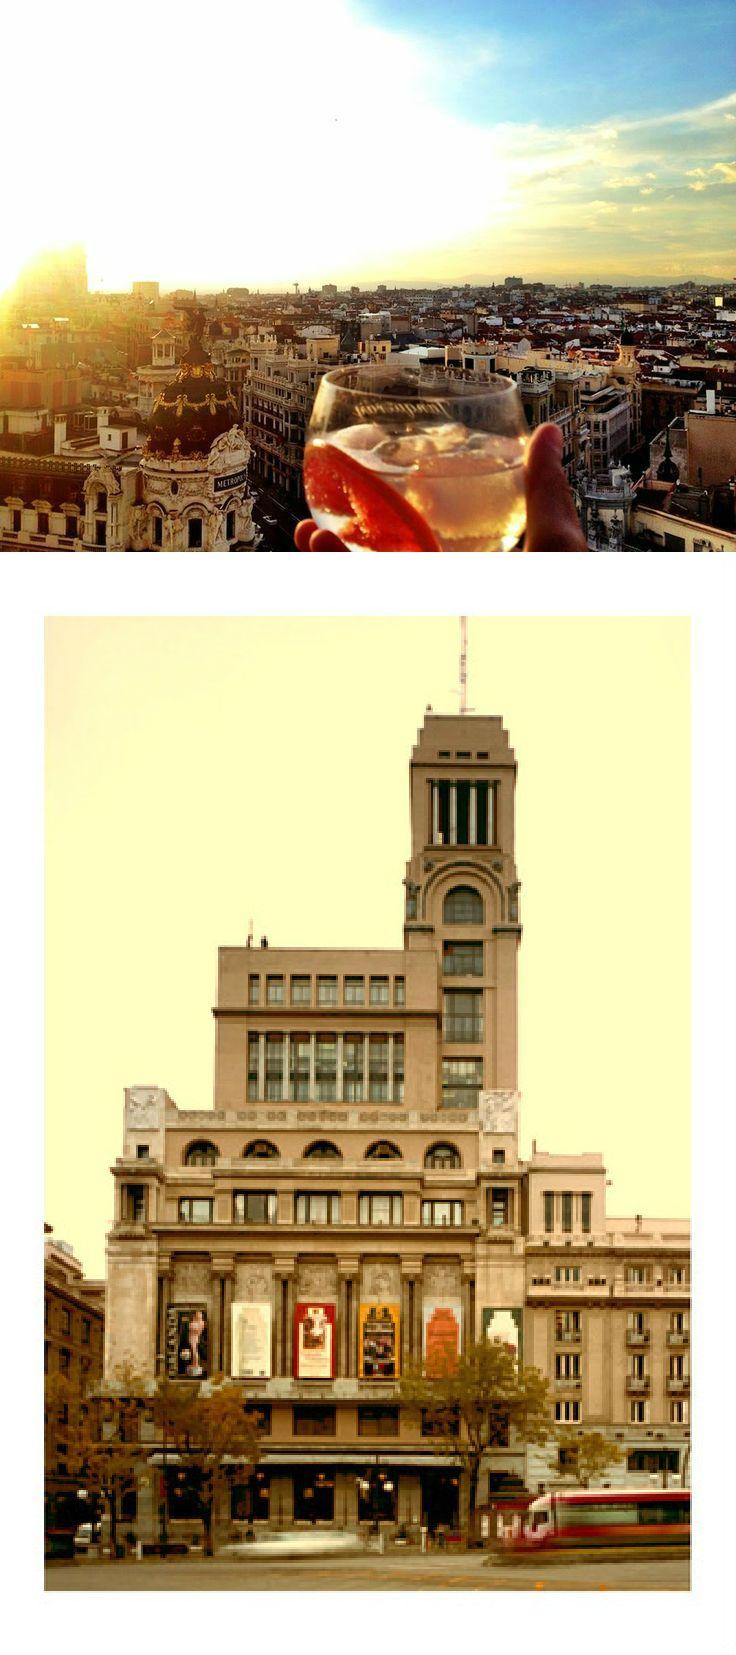 #Museum #Rooftop #Bar #Restaurant #Cafe Summer Hours: 09:00-02:00. Fri/Sat/Sun: 11:00-02:30. Winter Hours: 11:00-21:00. Rooftop entry 3€